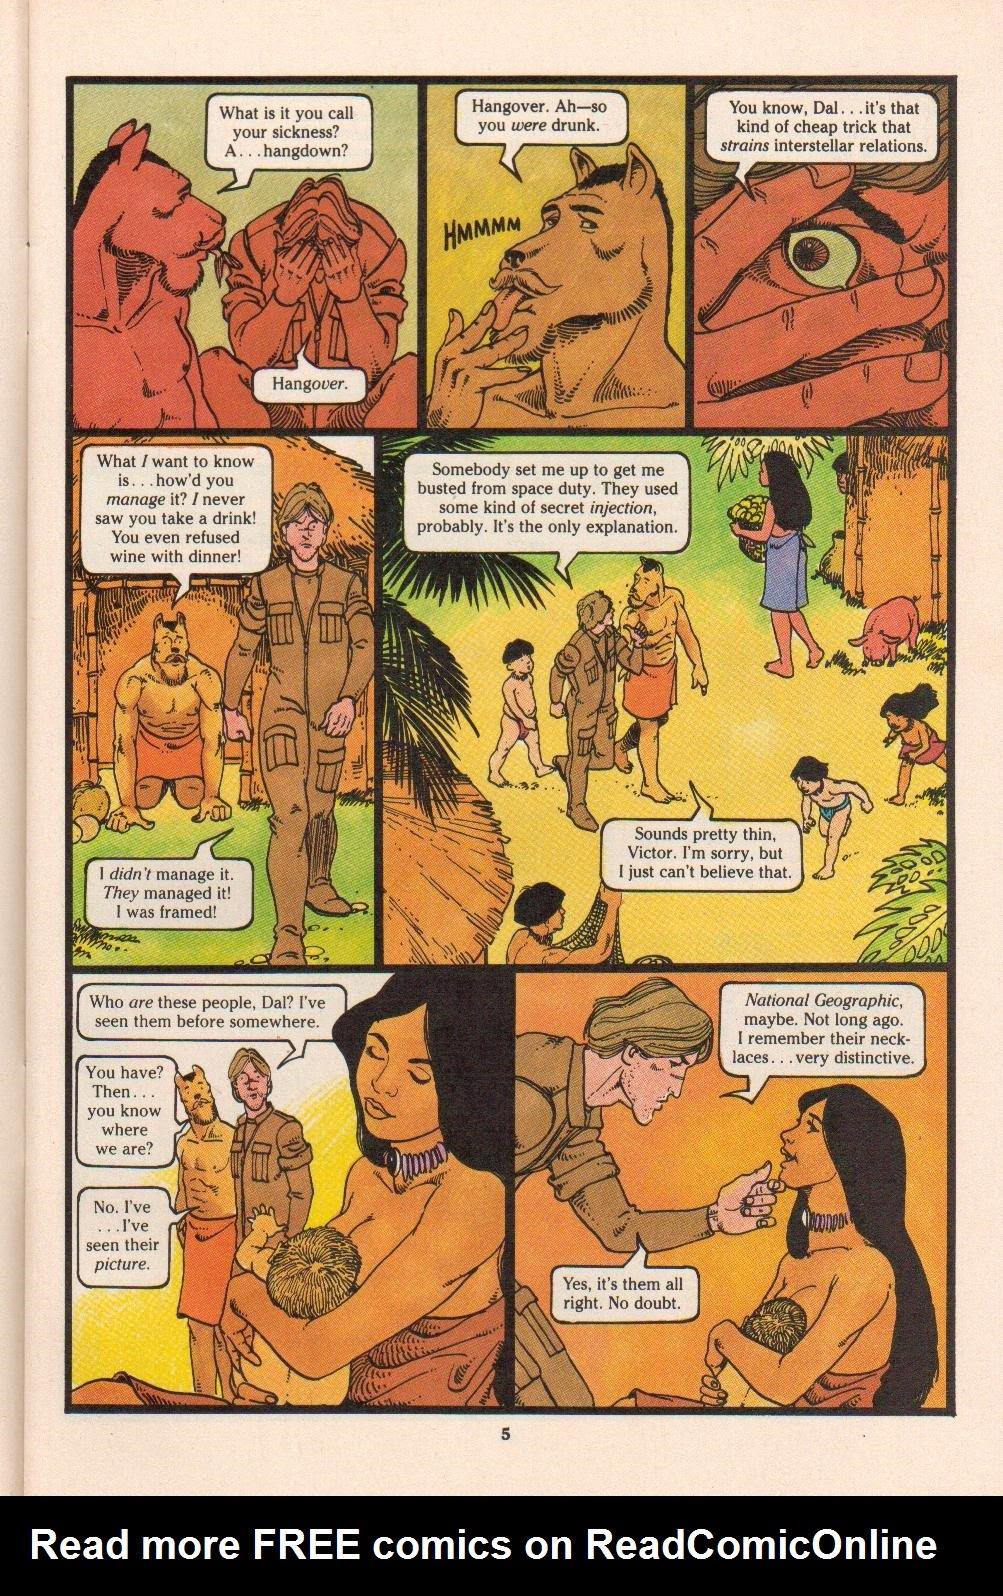 Read online Dalgoda comic -  Issue #4 - 7